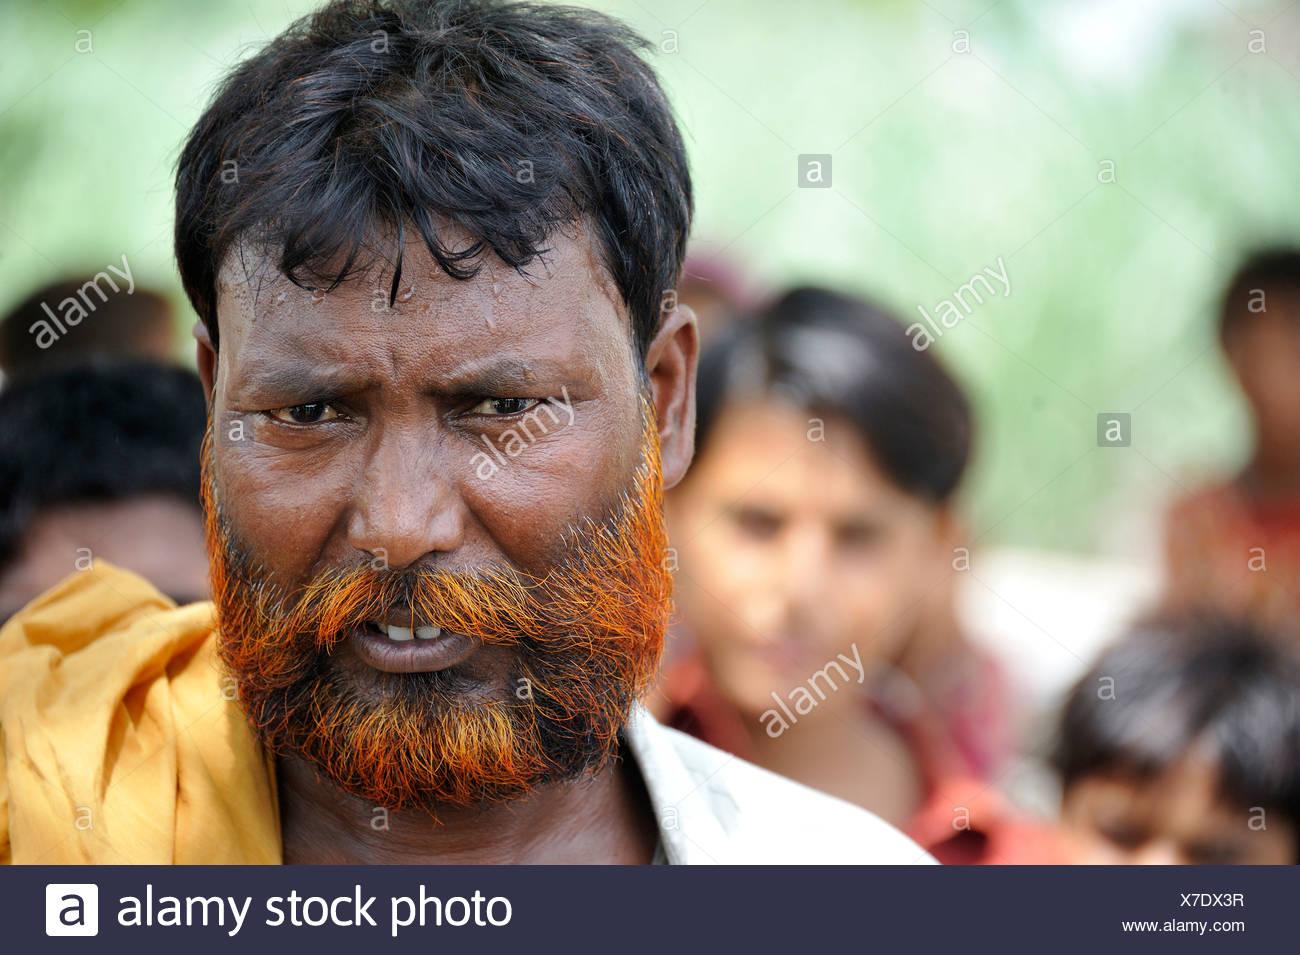 Henna Beard Stock Photos Henna Beard Stock Images Alamy